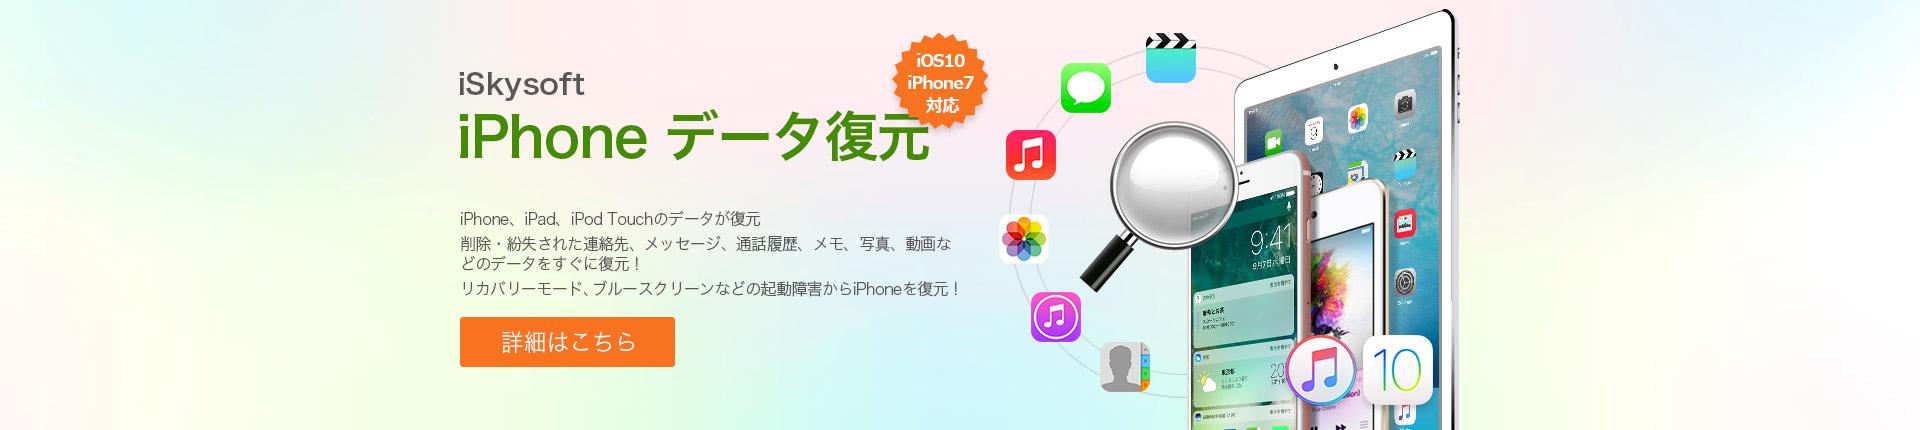 iSkysoft iPhone データ復元 for Windows